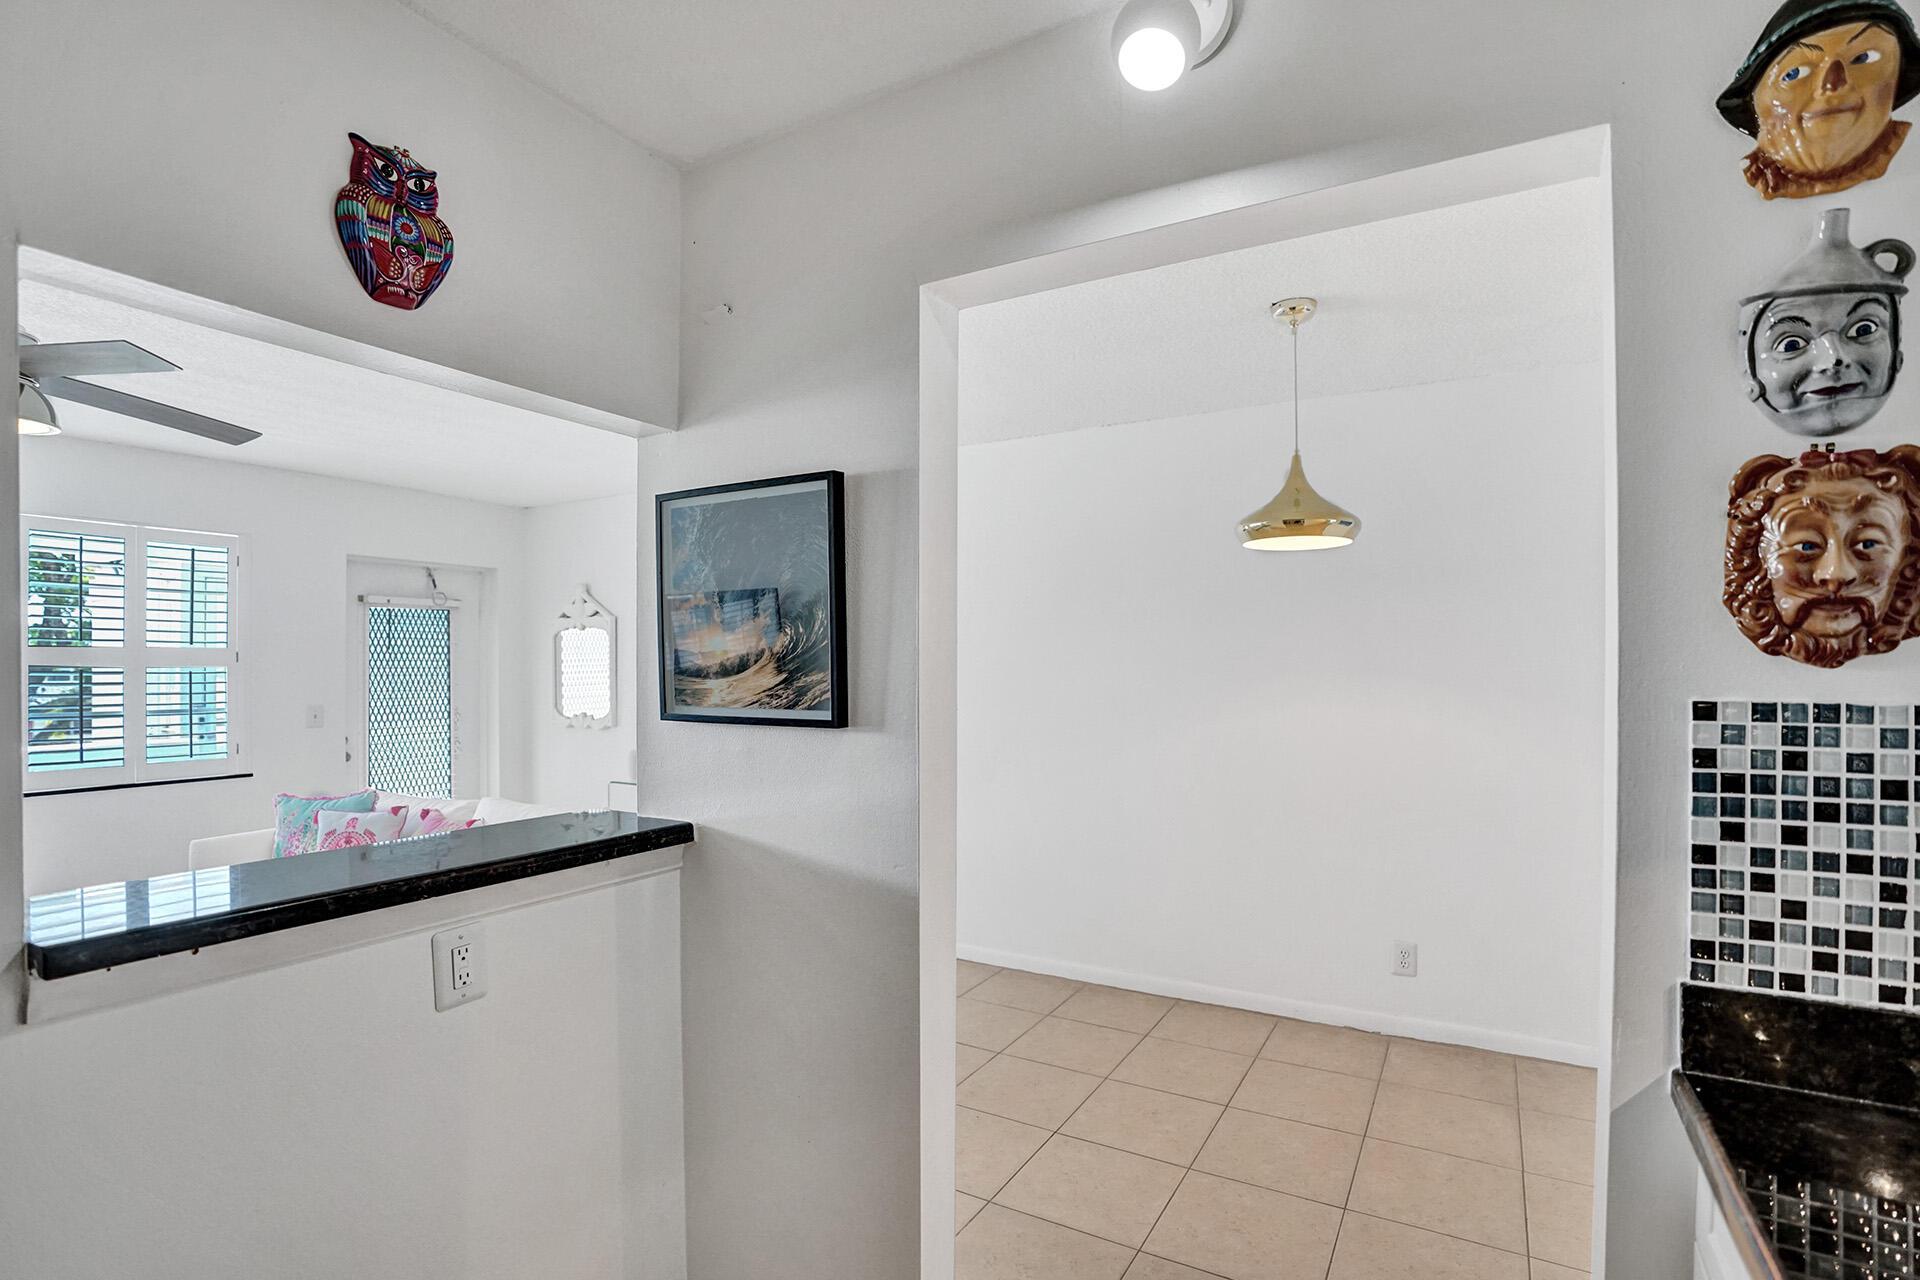 314 Durham I, Deerfield Beach, Florida 33442, 1 Bedroom Bedrooms, ,1 BathroomBathrooms,Residential,For Sale,Durham I,RX-10707758